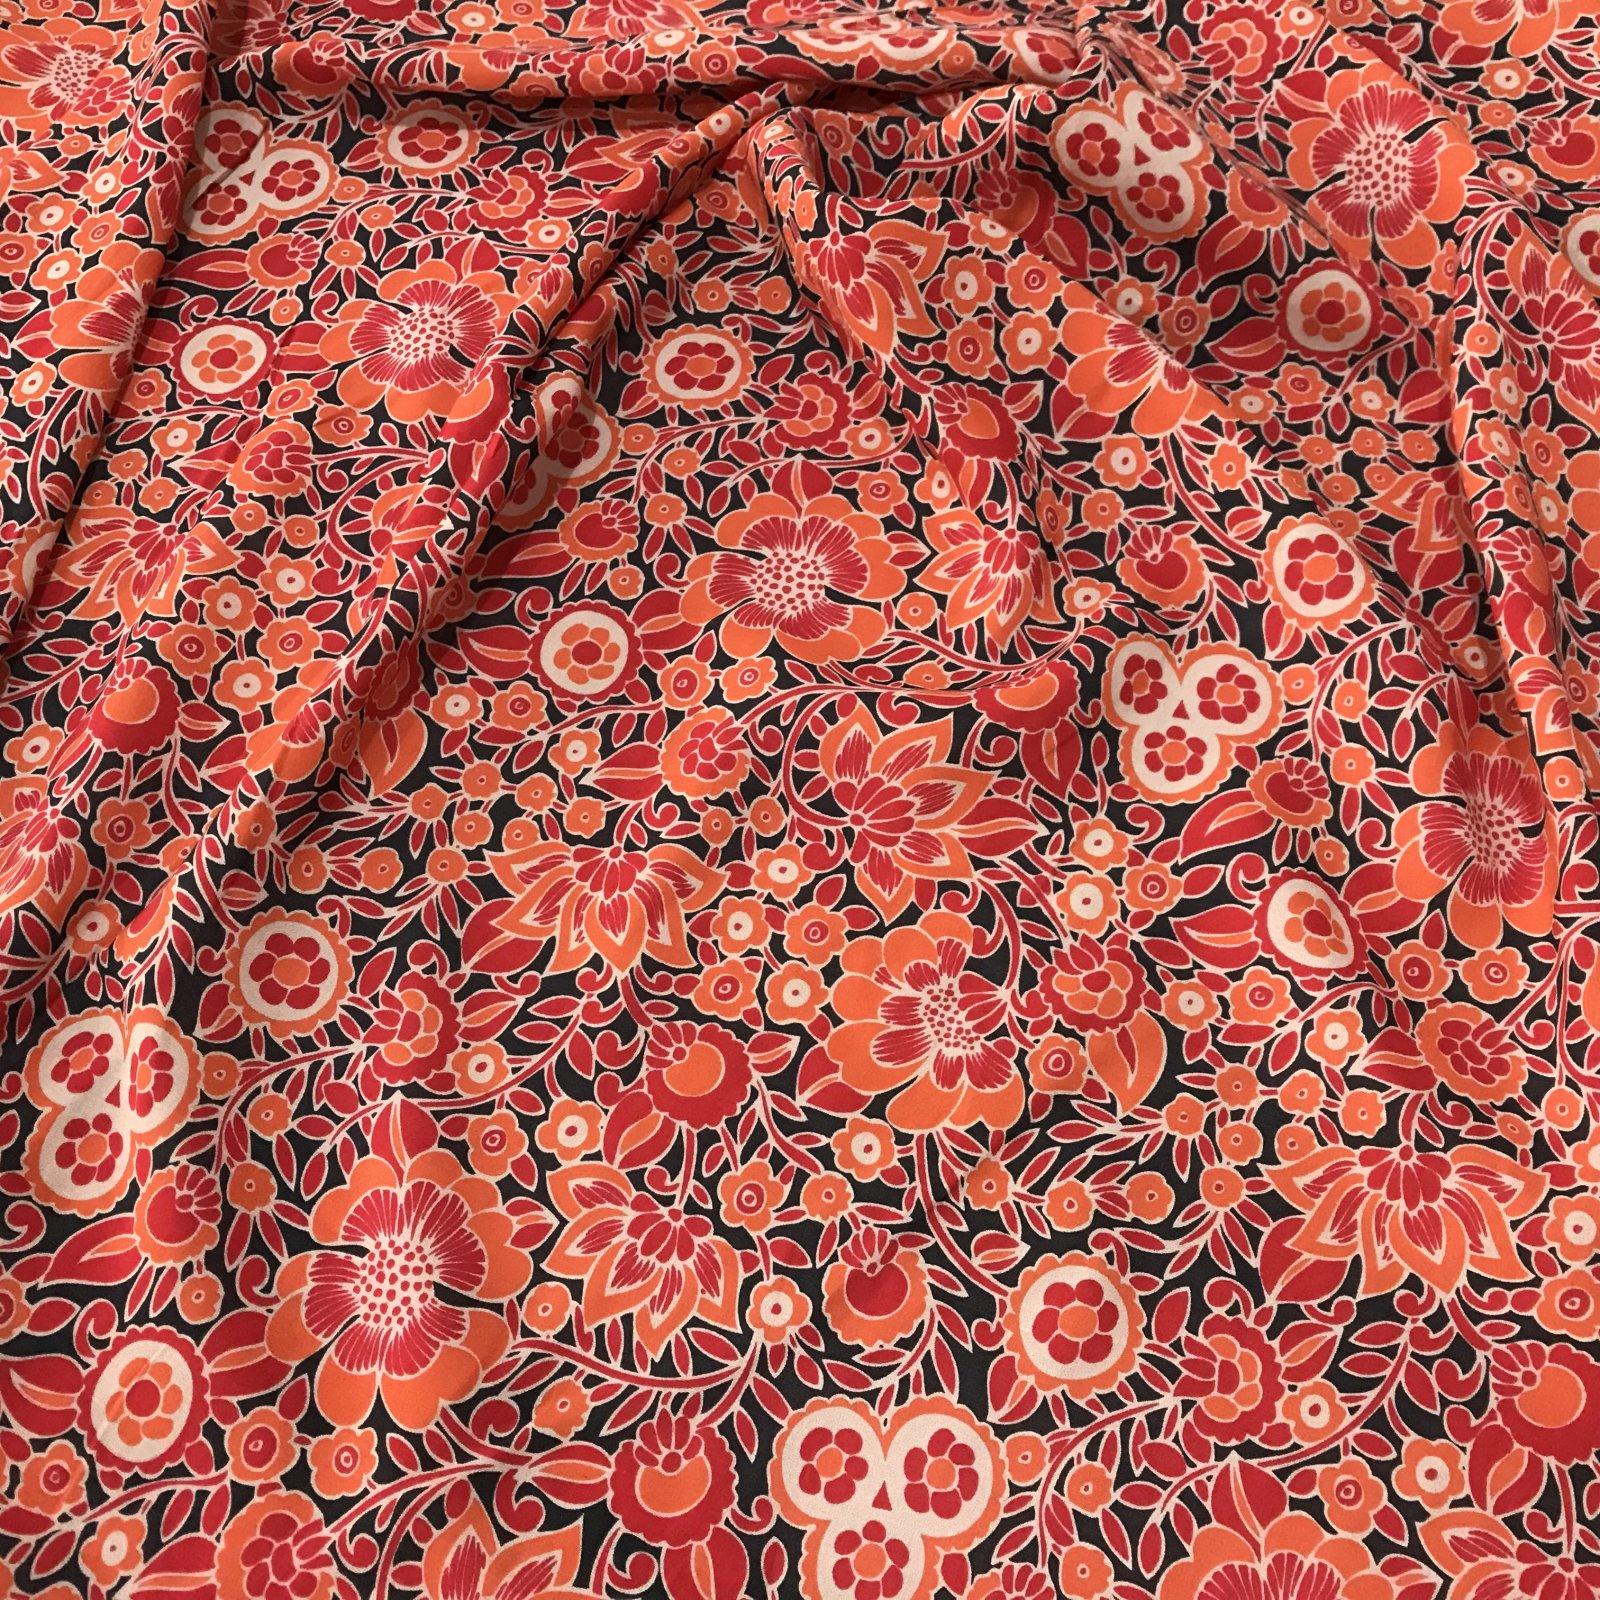 Rayon Challis - Bright Floral Print